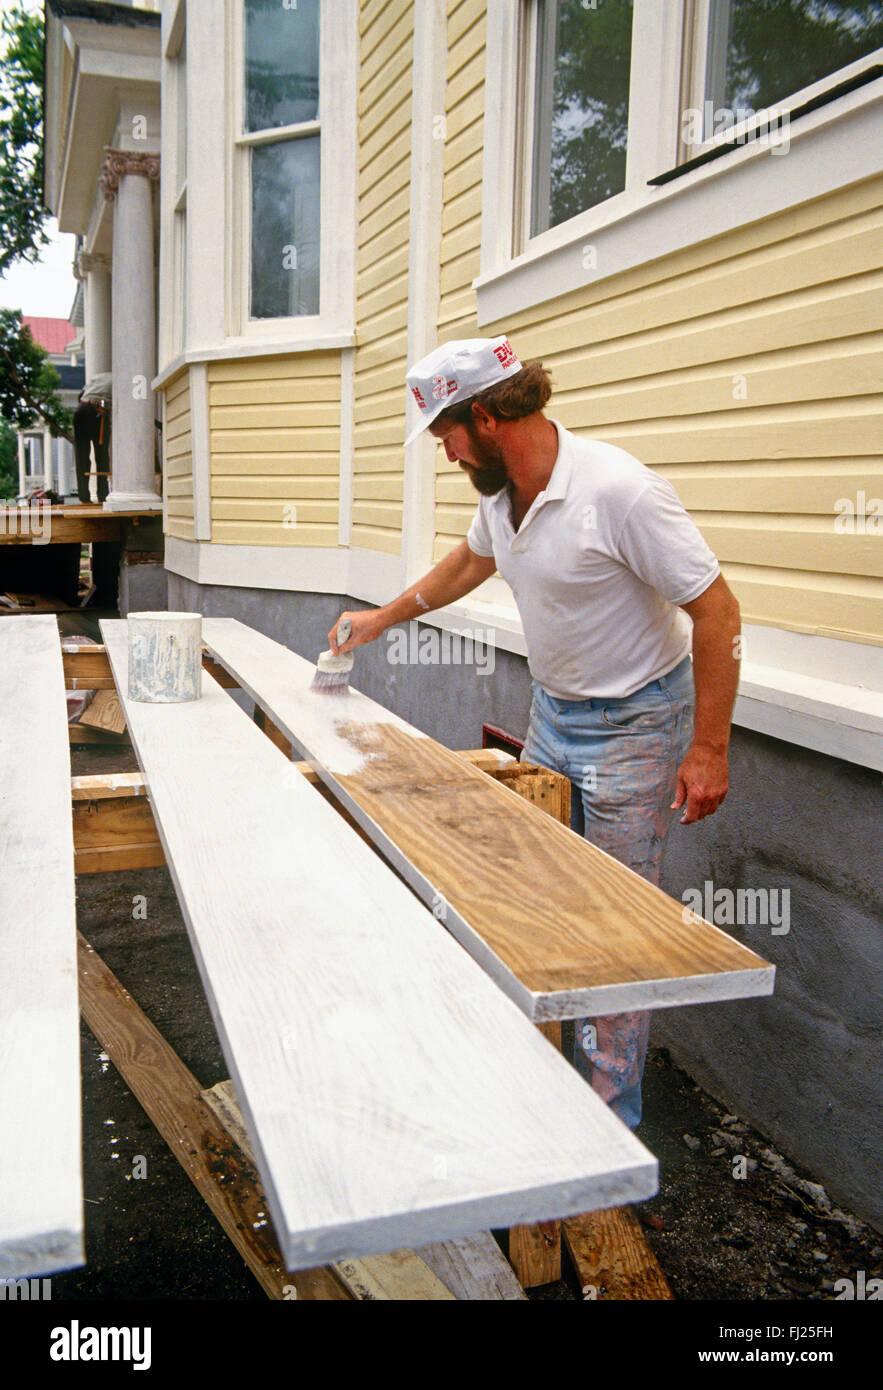 Professional painter painting historical house, Charleston, South Carolina, USA - Stock Image